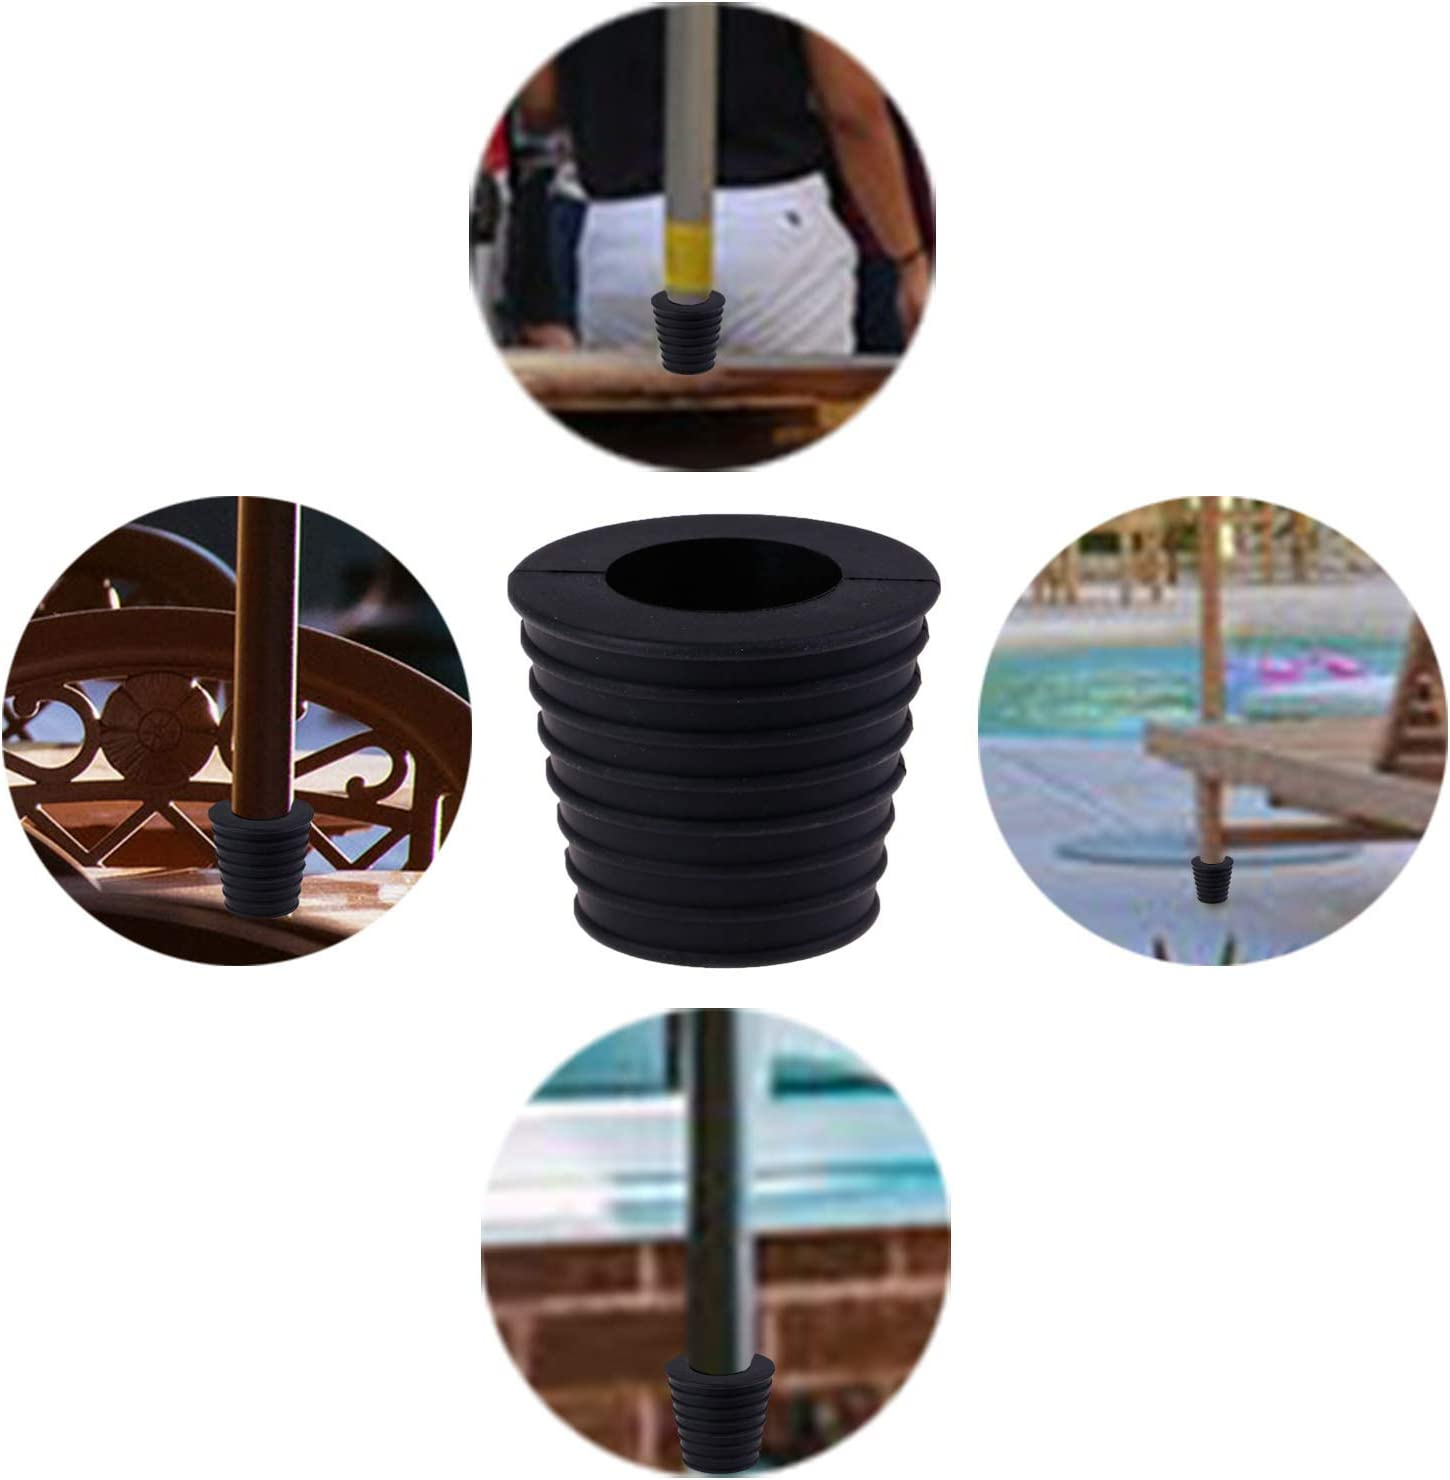 2, Brown,Black LOCOLO Umbrella Pole Wedge Fits 1.5 Inch Umbrella Umbrella Cone for Patio Table Hole Opening Base 1.9 to 2.6 inch